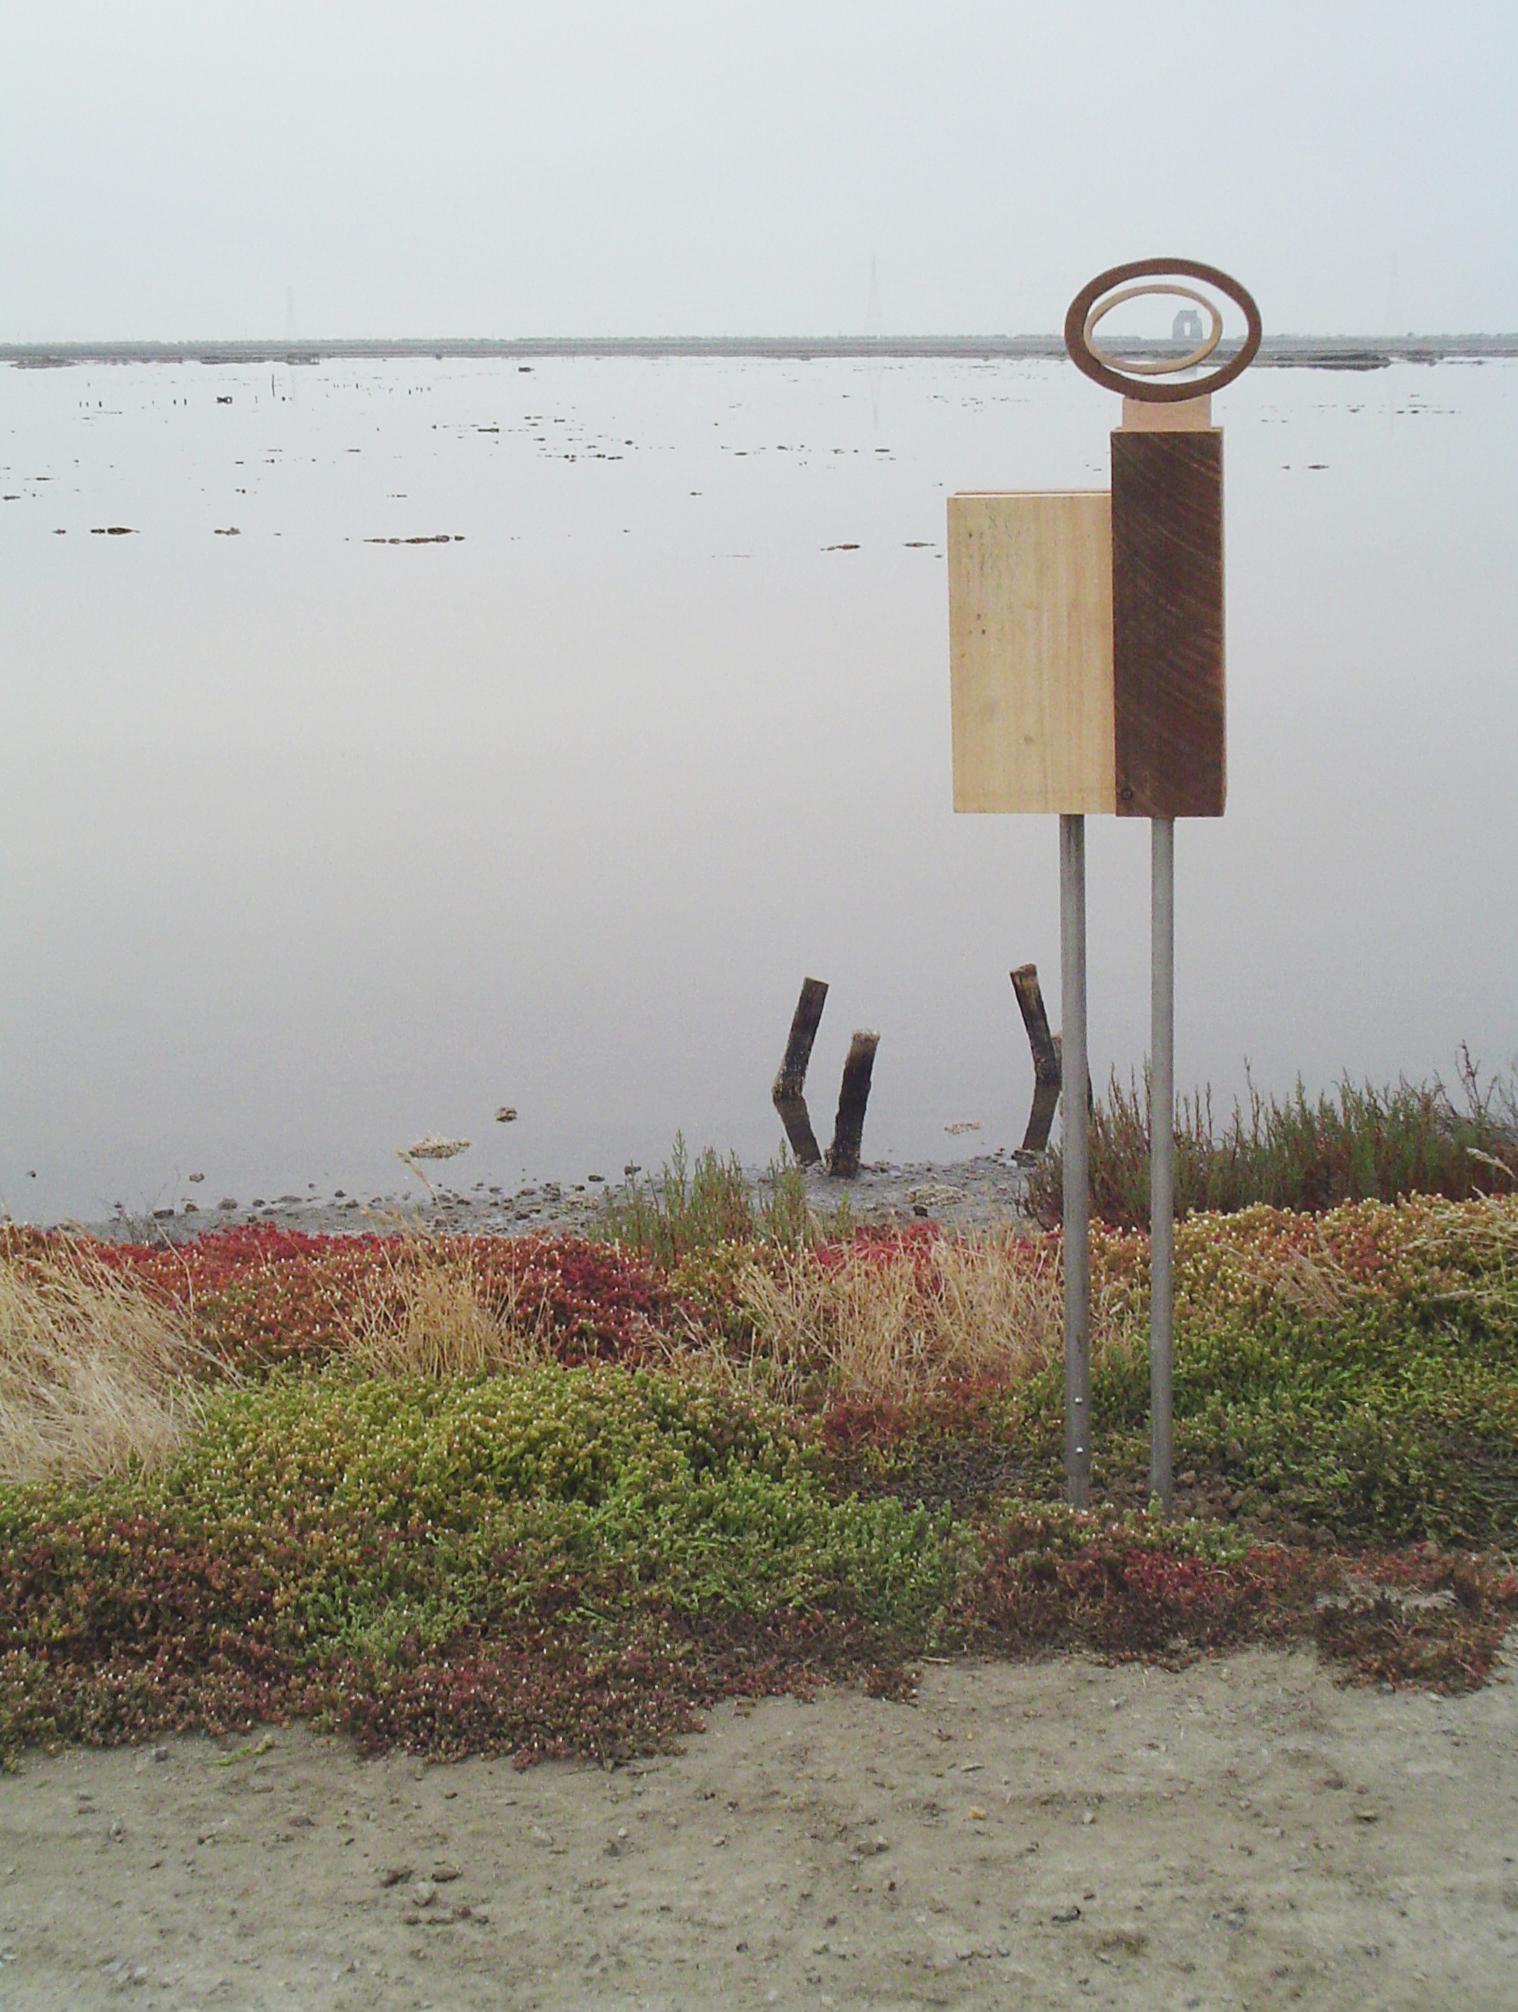 A Bird's Eye View - 4 - SF Bay NWR - Fremont, CA - copyright Marie S.A. Sorensen - 2005